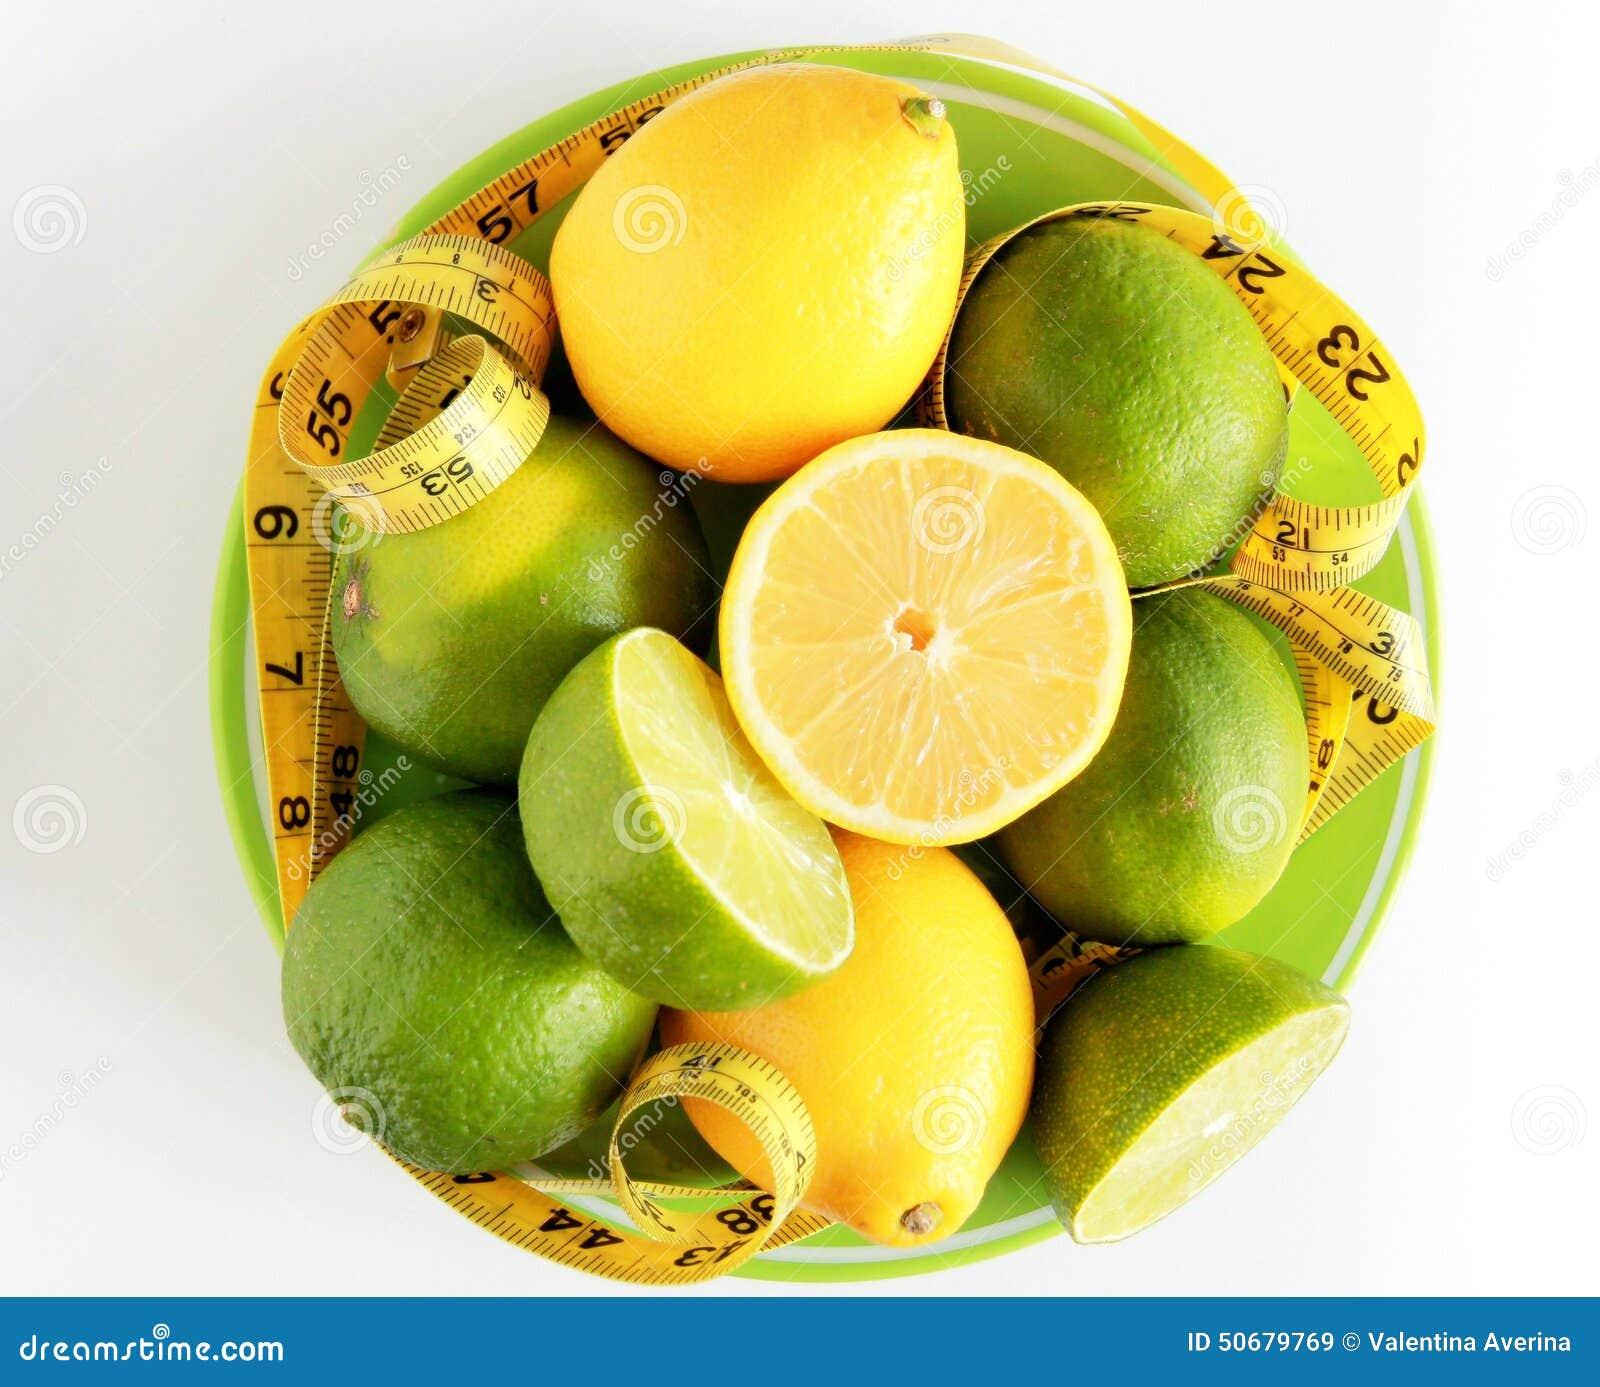 Download 查出的损失评定躯干重量白人妇女 在柠檬附近被包裹的测量的磁带 库存图片 - 图片 包括有 绿色, 抽象: 50679769